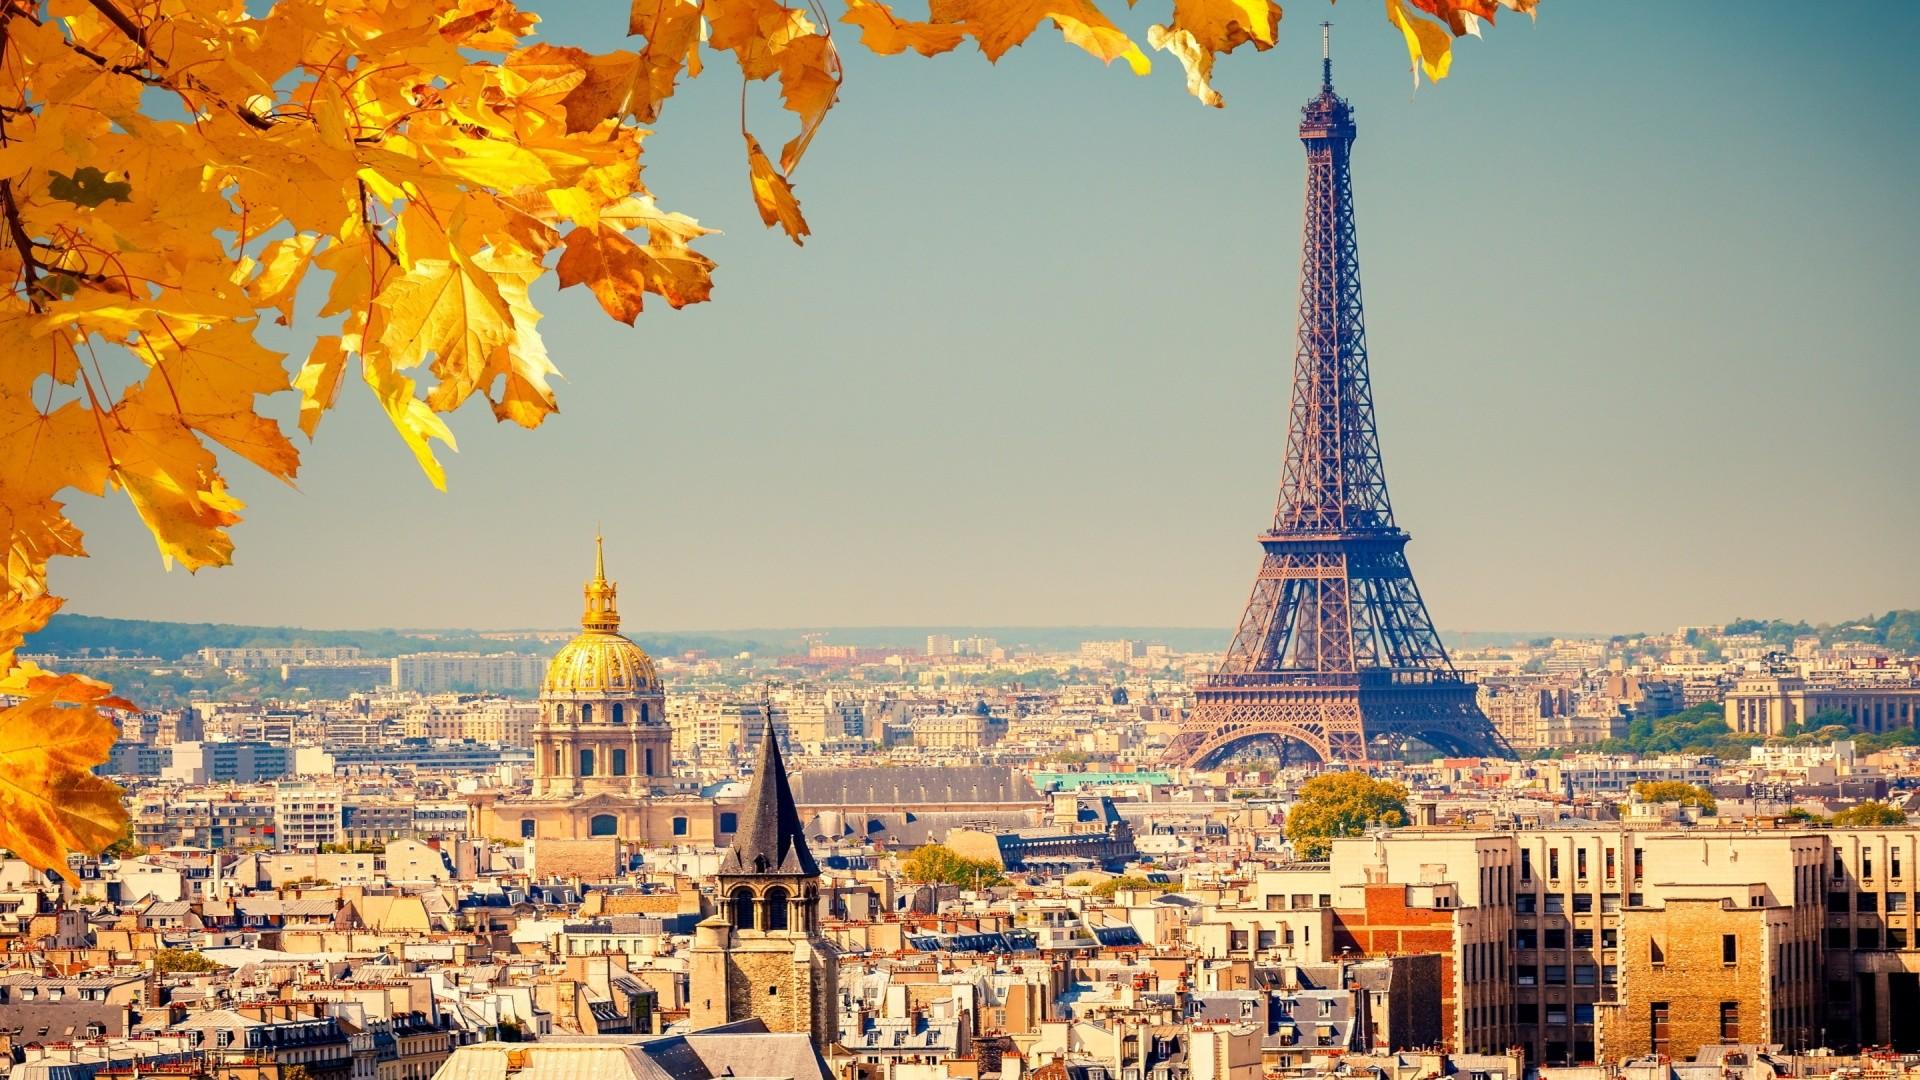 hd free paris images hd desktop wallpapers 1080p windows wallpapers smart  phone background photos free images